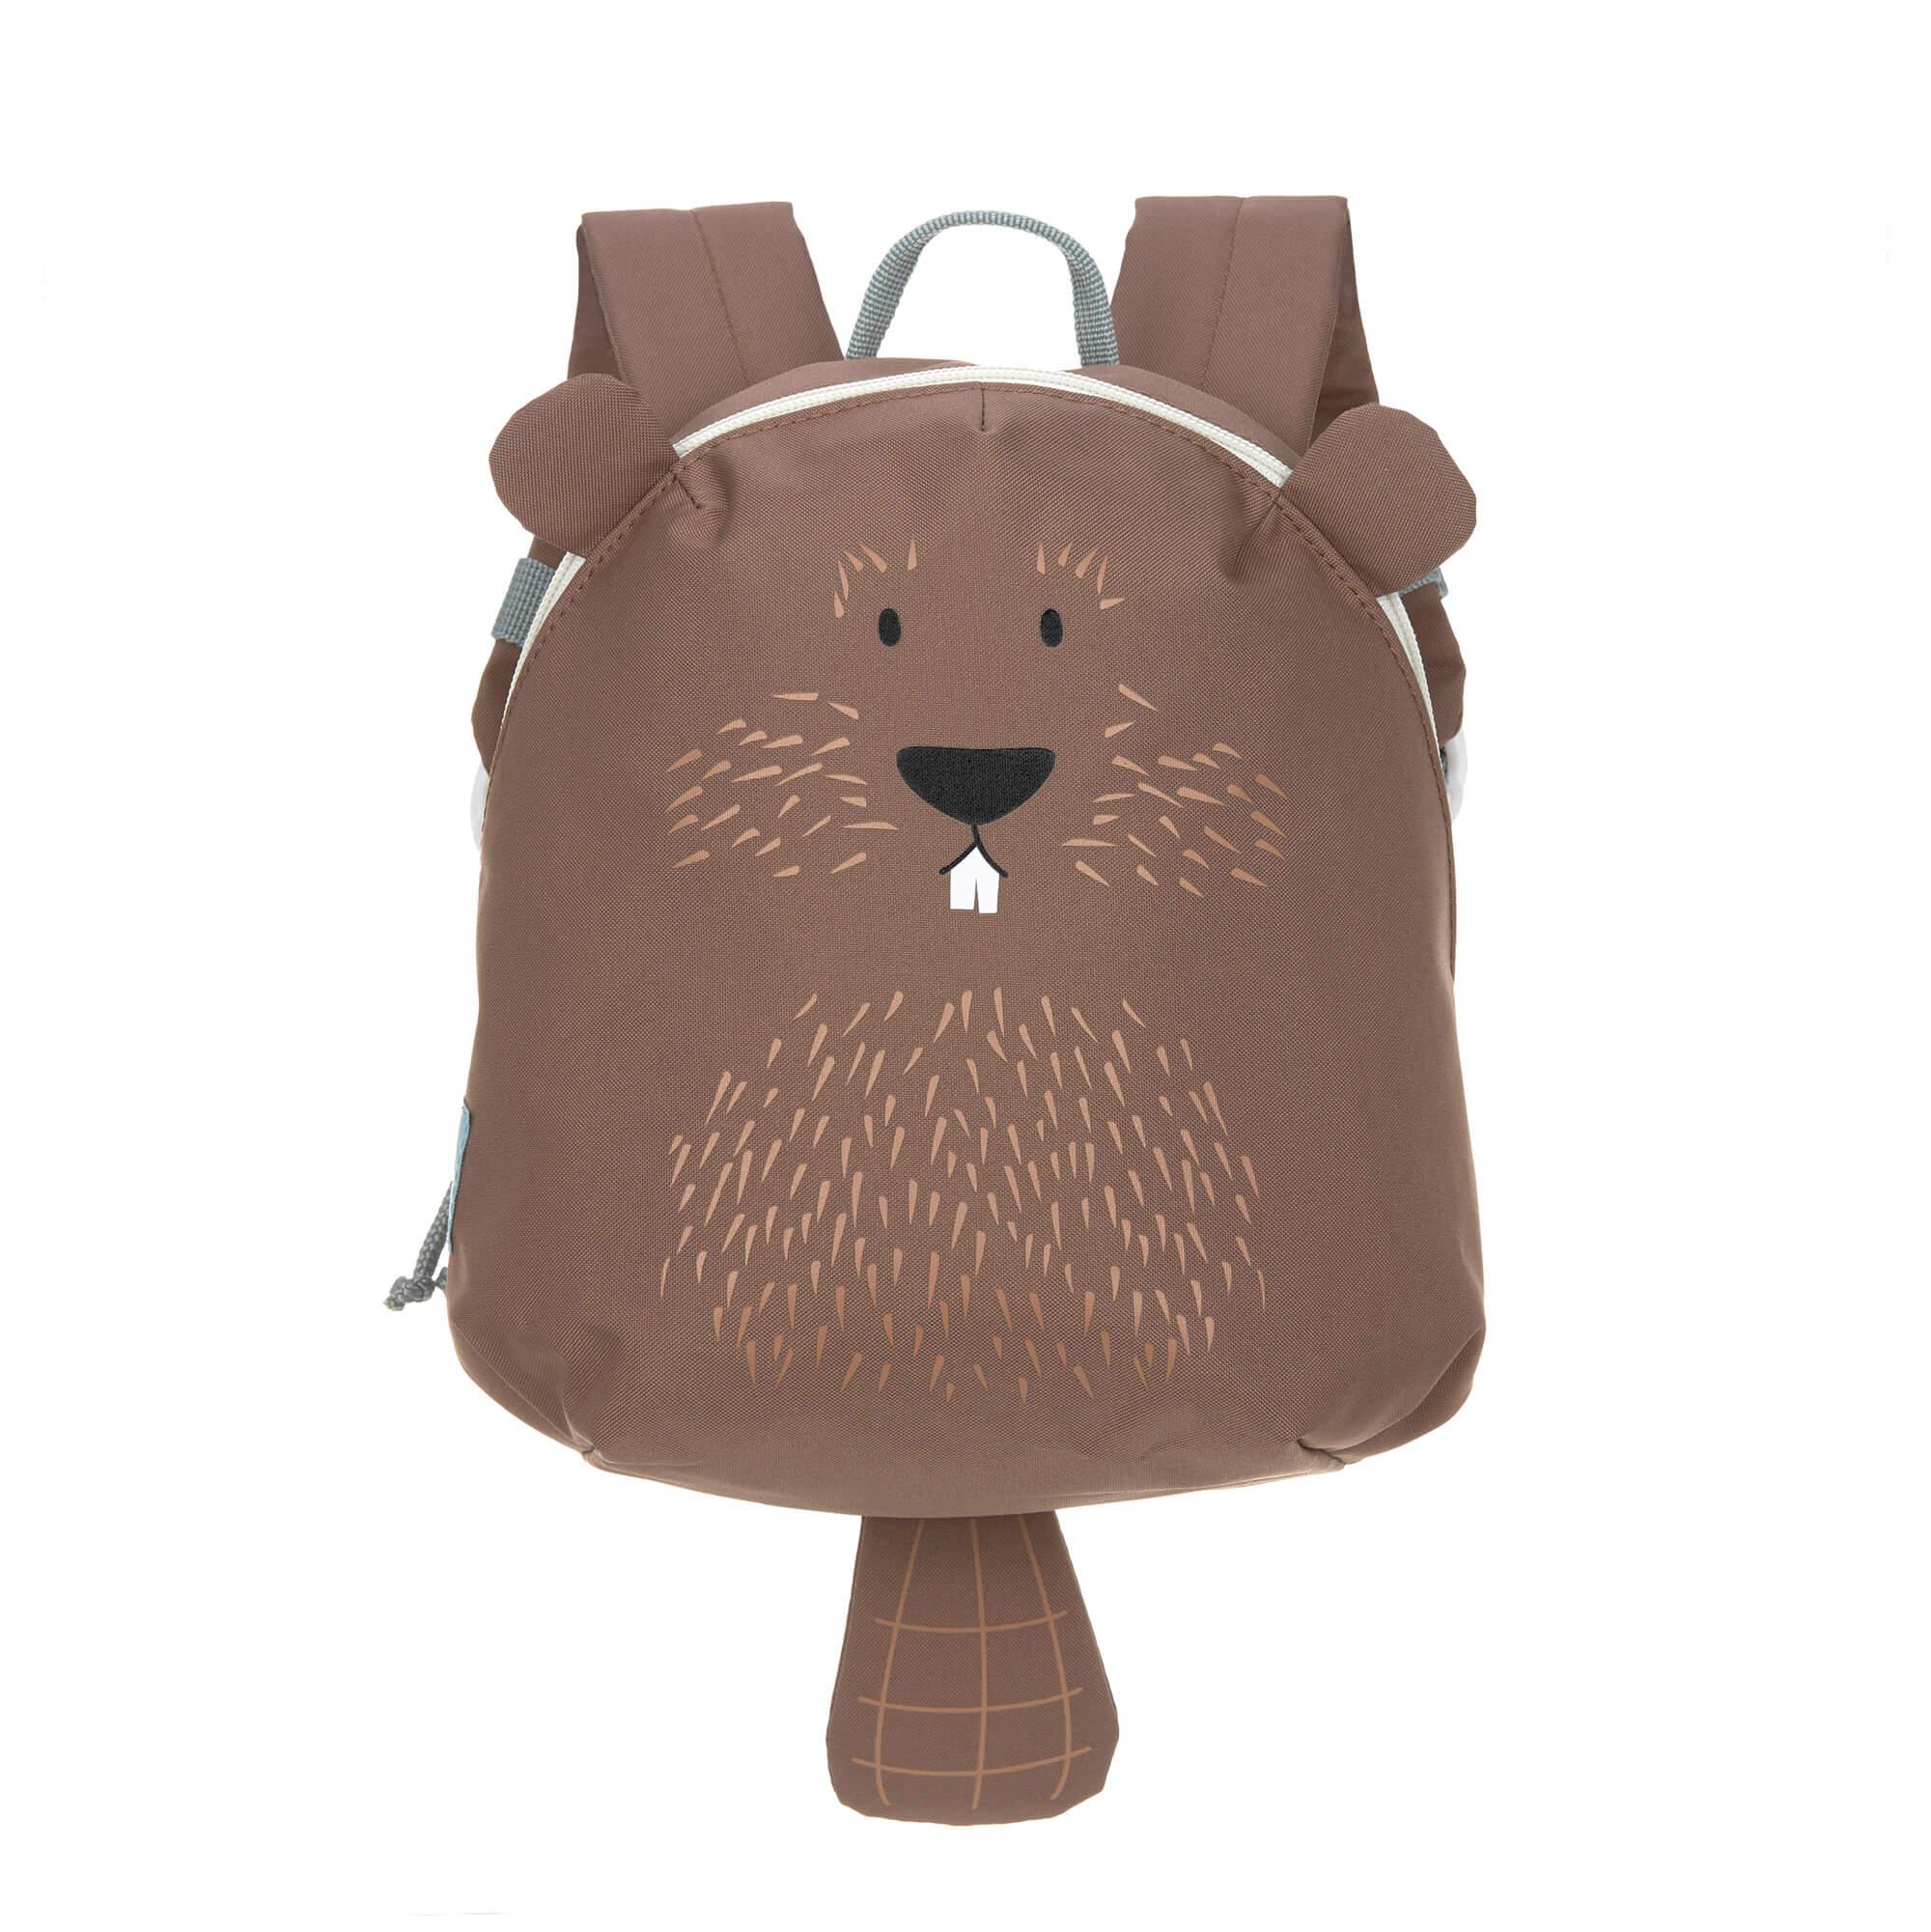 Kindergartenrucksack Biber - Tiny Backpack - About Friends Beaver - Lässig